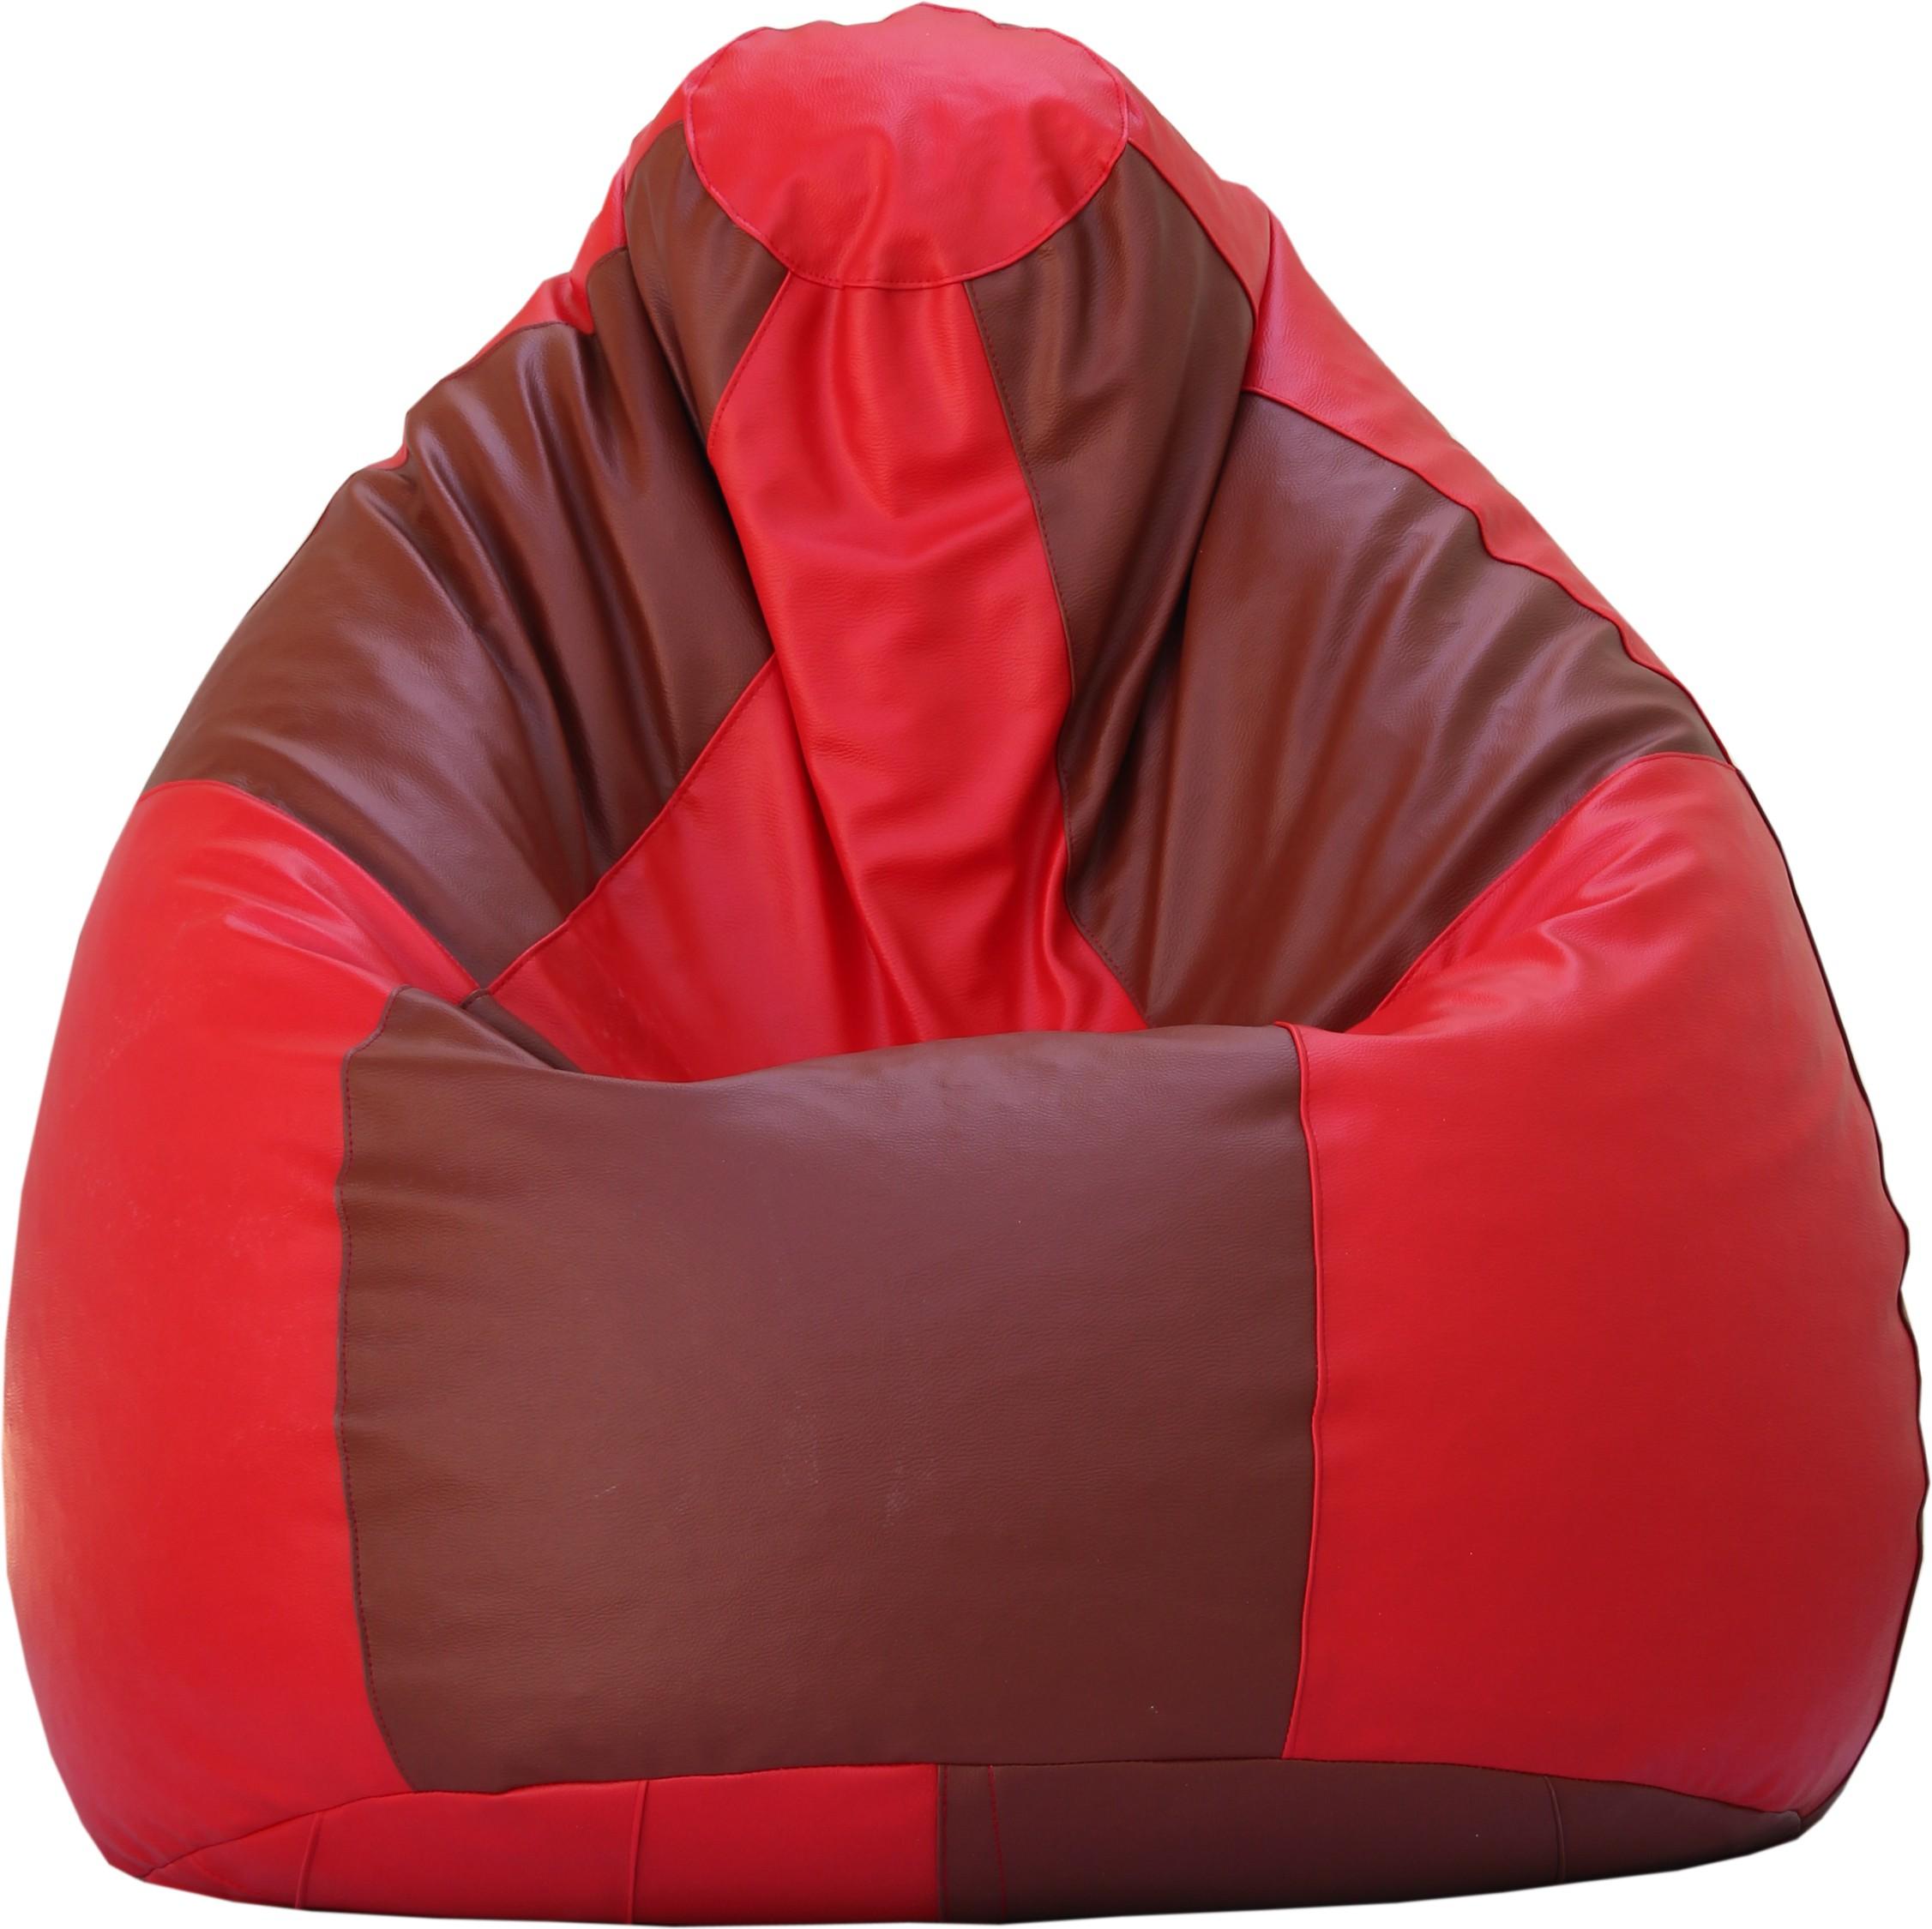 View Beanskart XXL Bean Bag XXL (Filled With Beans) Bean Bag  With Bean Filling(Red, Tan) Furniture (Beanskart)